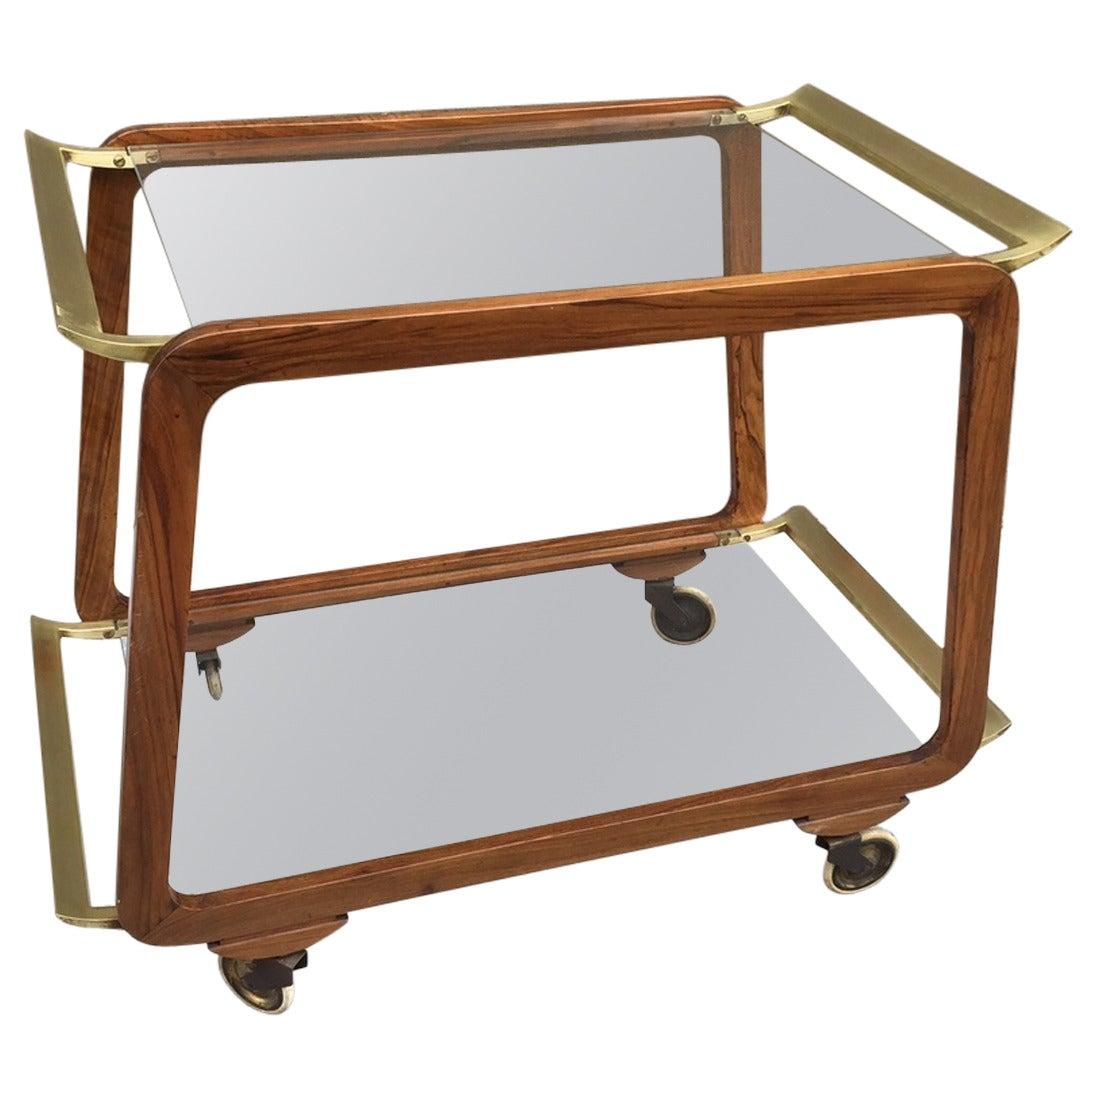 austrian walnut and brass bar cart for sale at 1stdibs. Black Bedroom Furniture Sets. Home Design Ideas